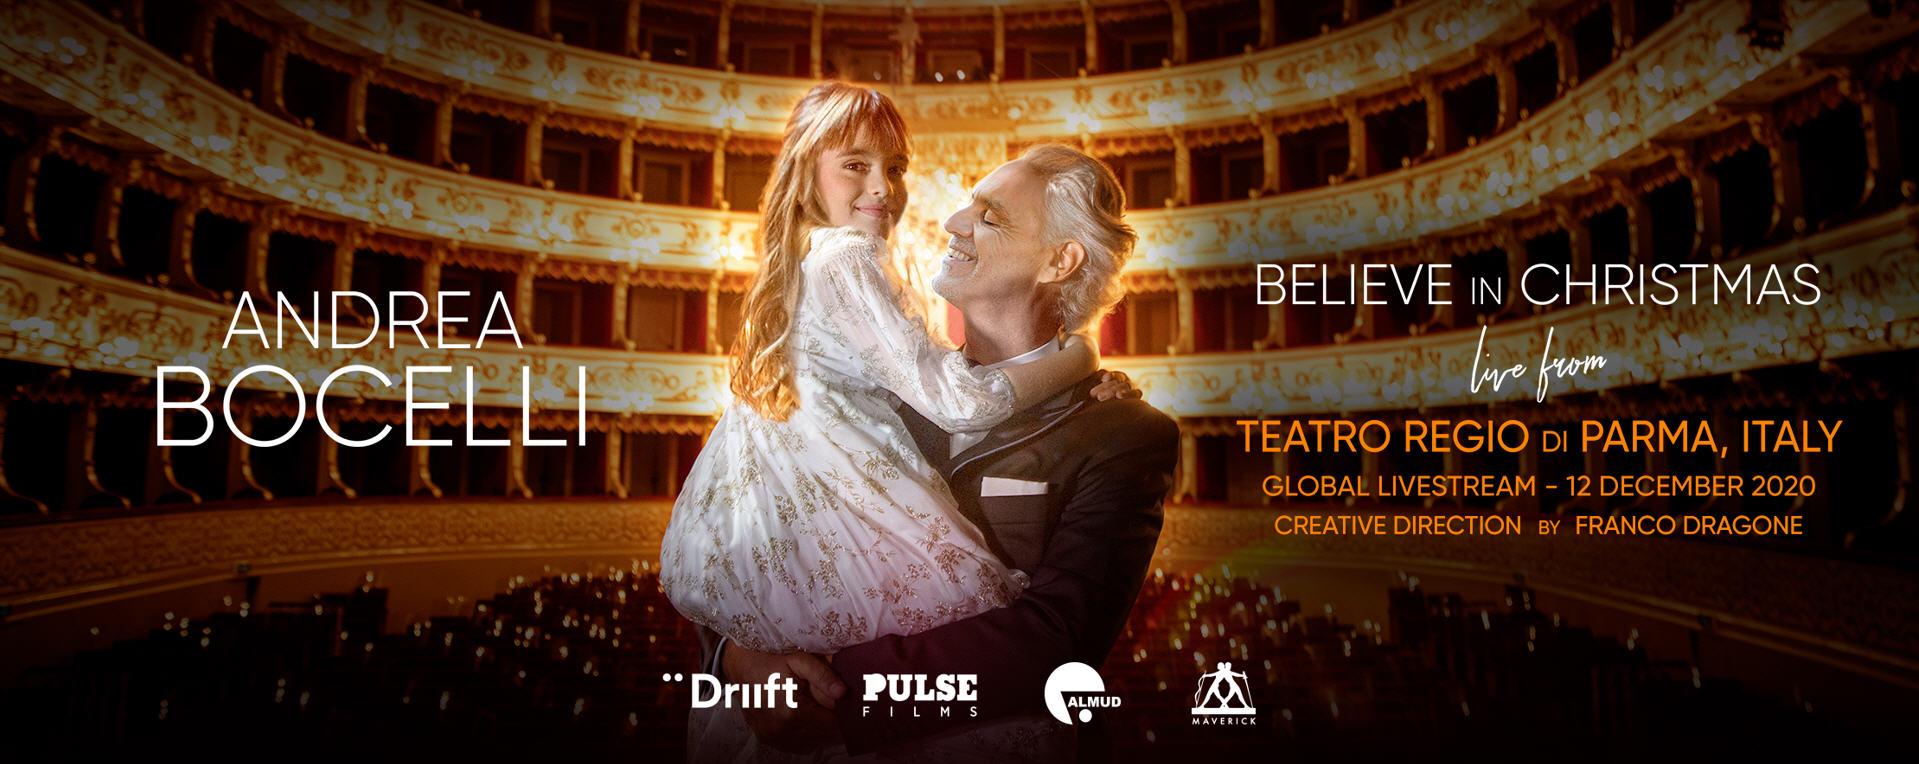 «Believe in Christmas»: Андреа Бочелли даст рождественский онлайн-концерт